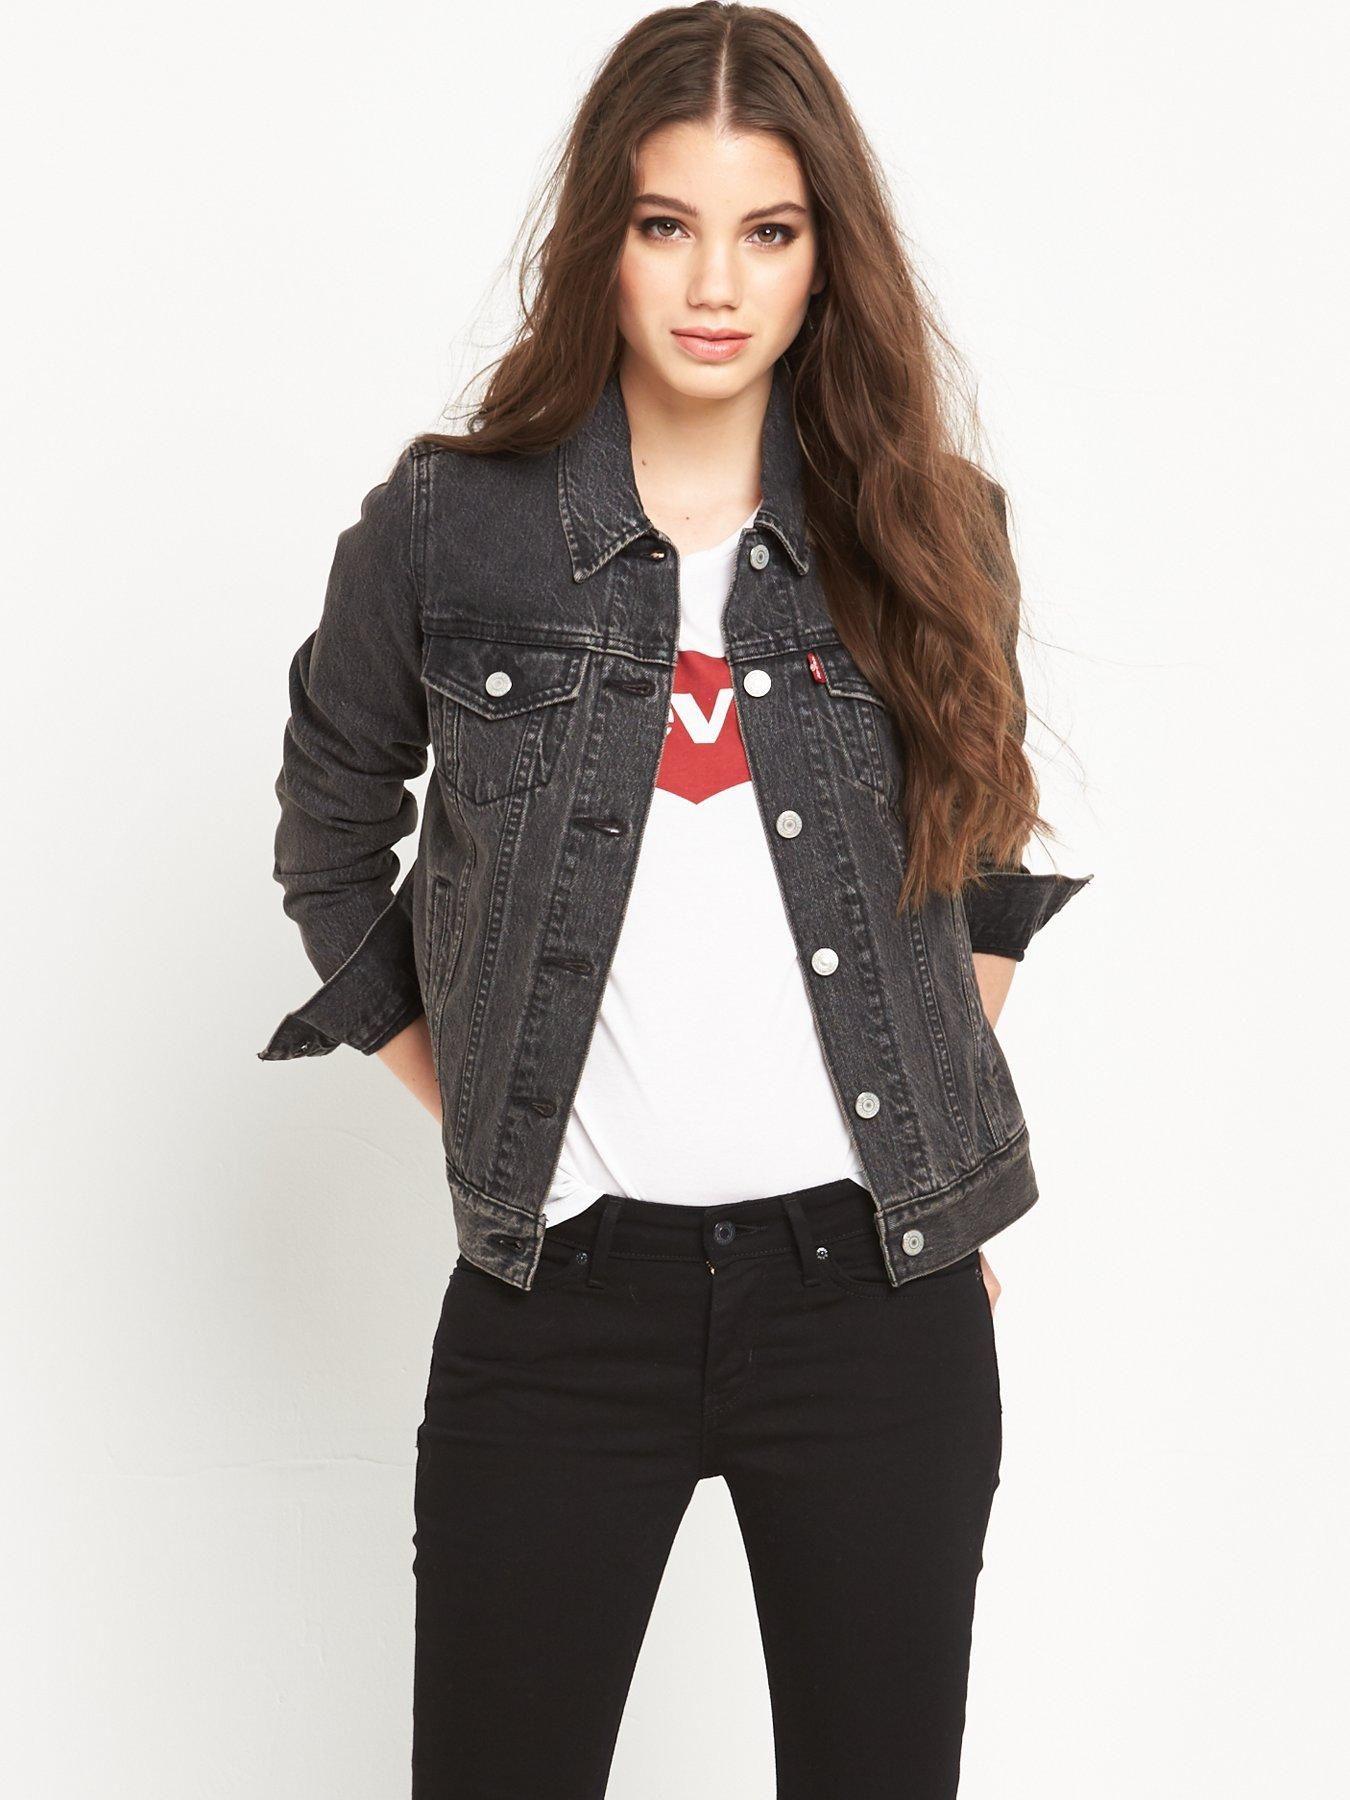 30a51e6ea2 Levi s® Vintage Denim Trucker Jacket - Mountain Black Borrowed from the  boys - this vintage denim trucker jacket by Levi s® is perfect for  channeling tough ...